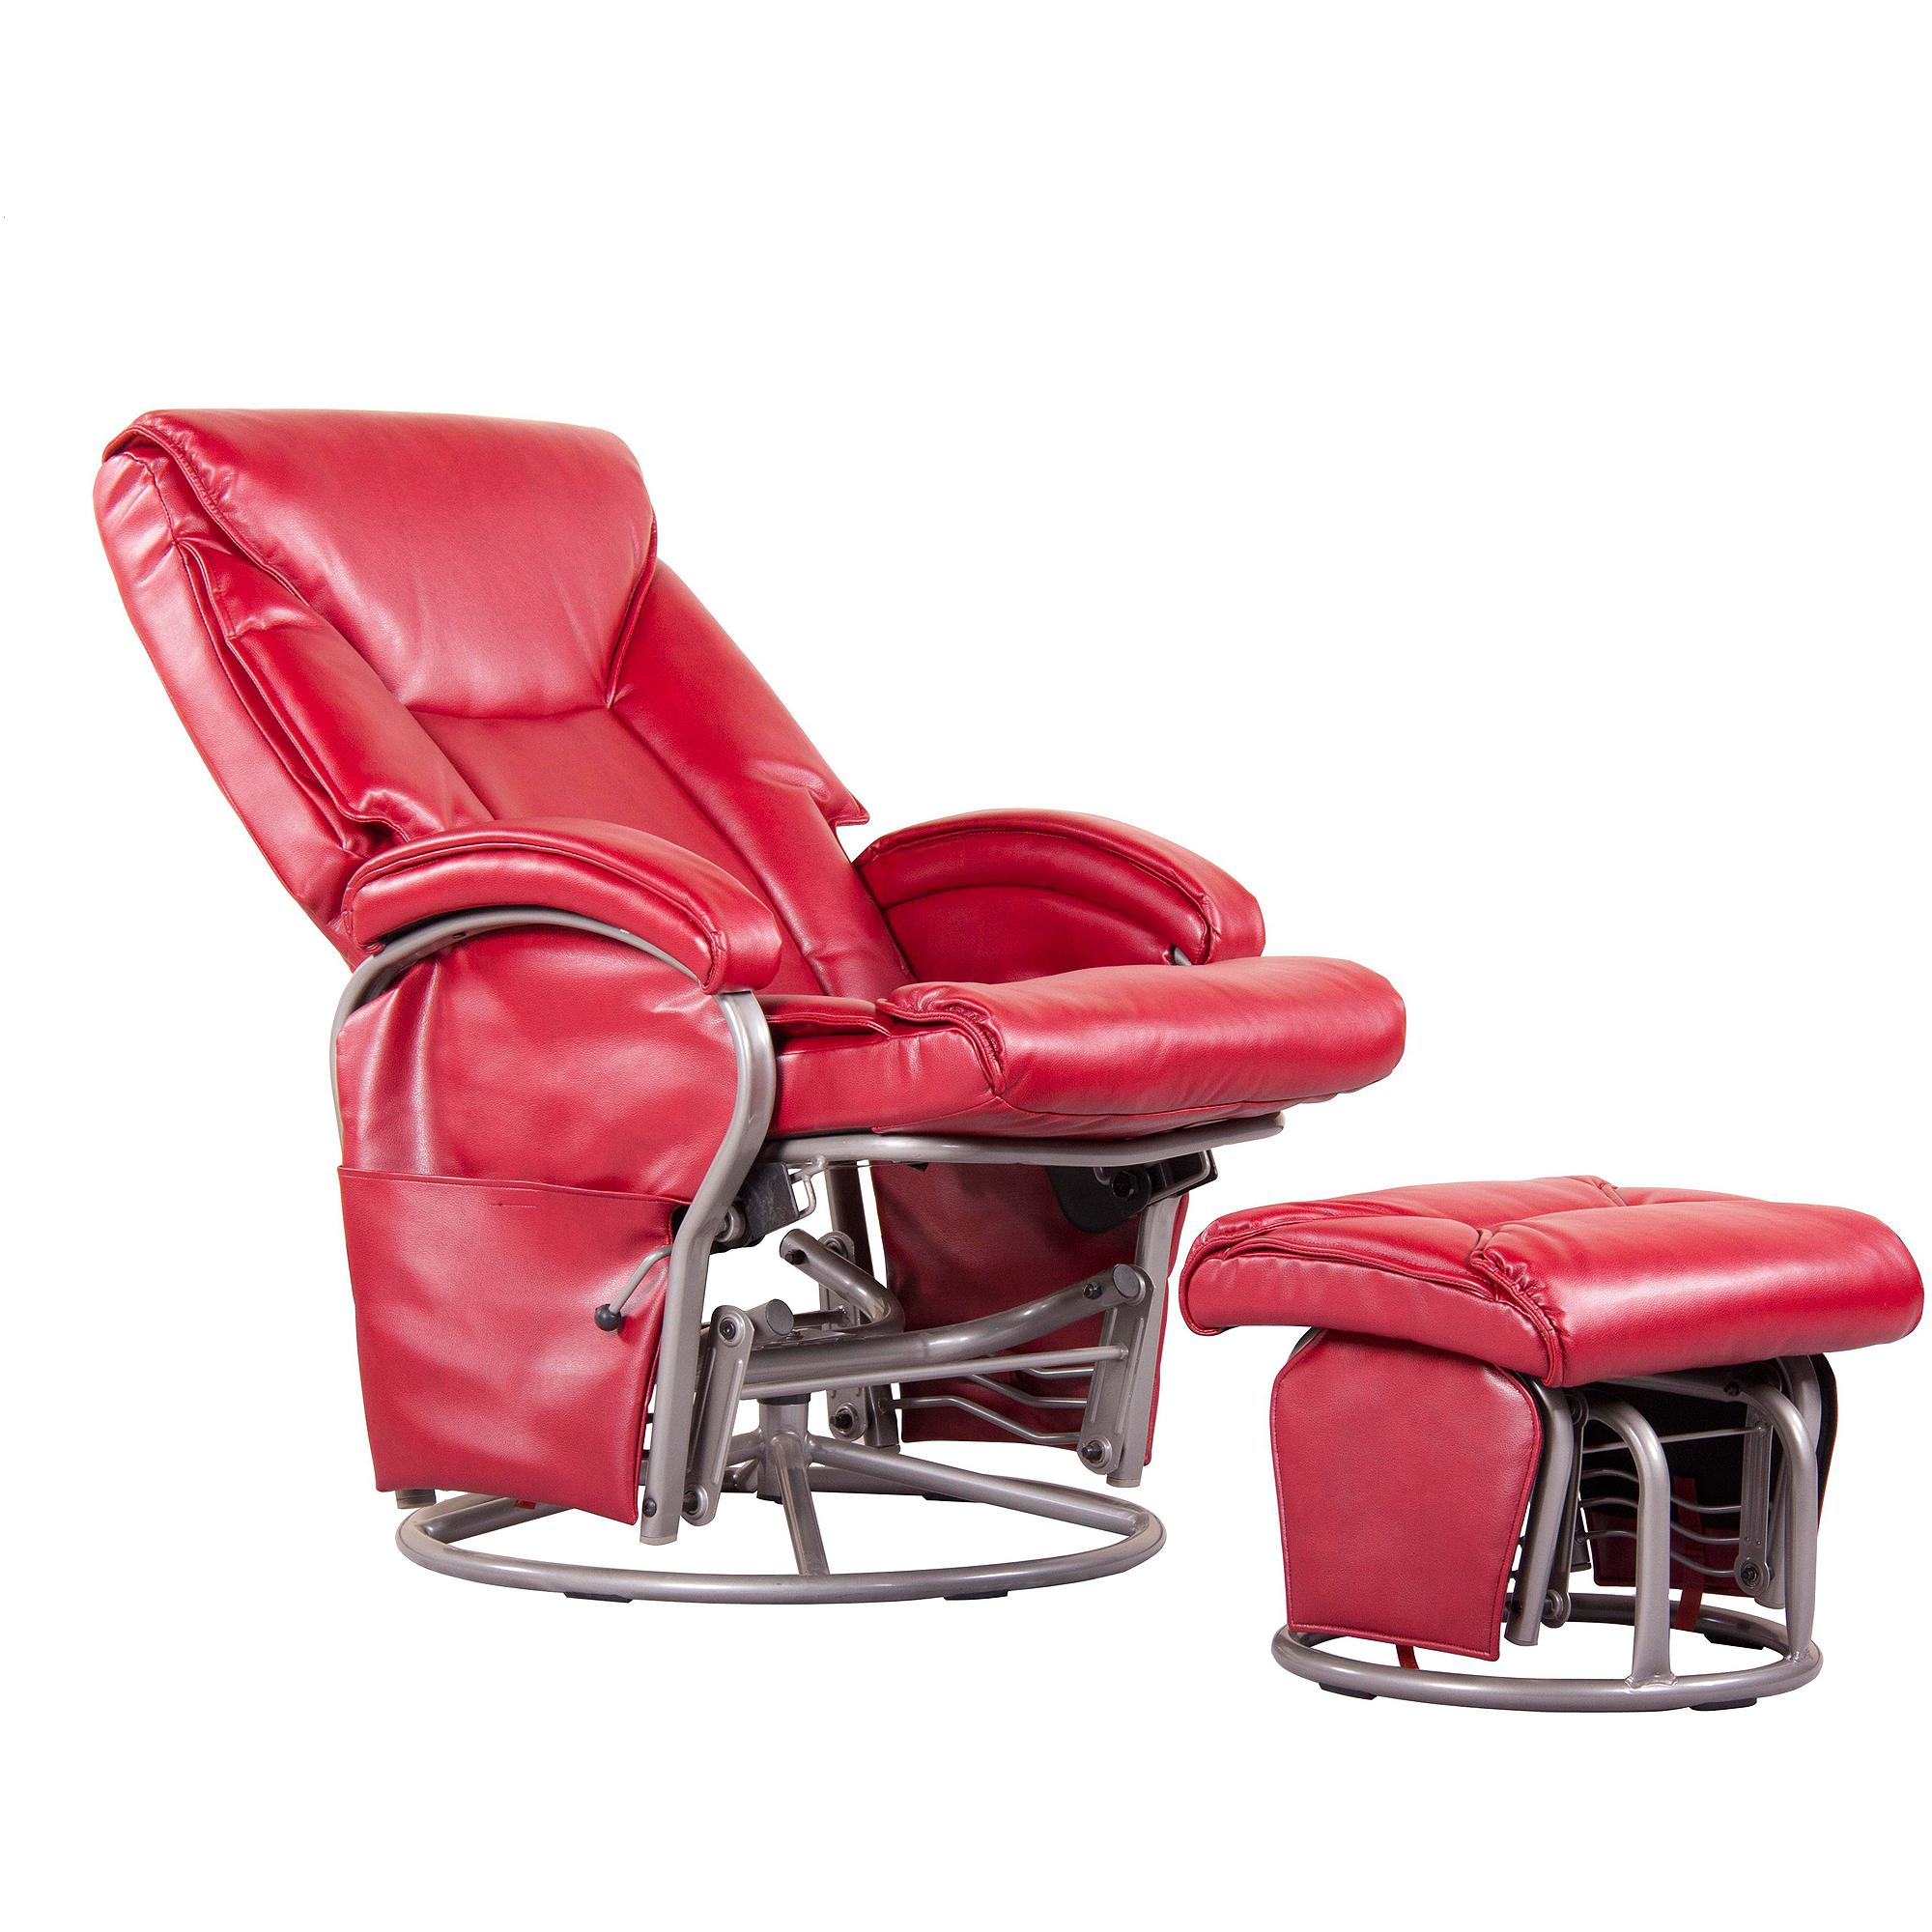 Shermag Swivel Glider Rocker, Bonded Leather, Red